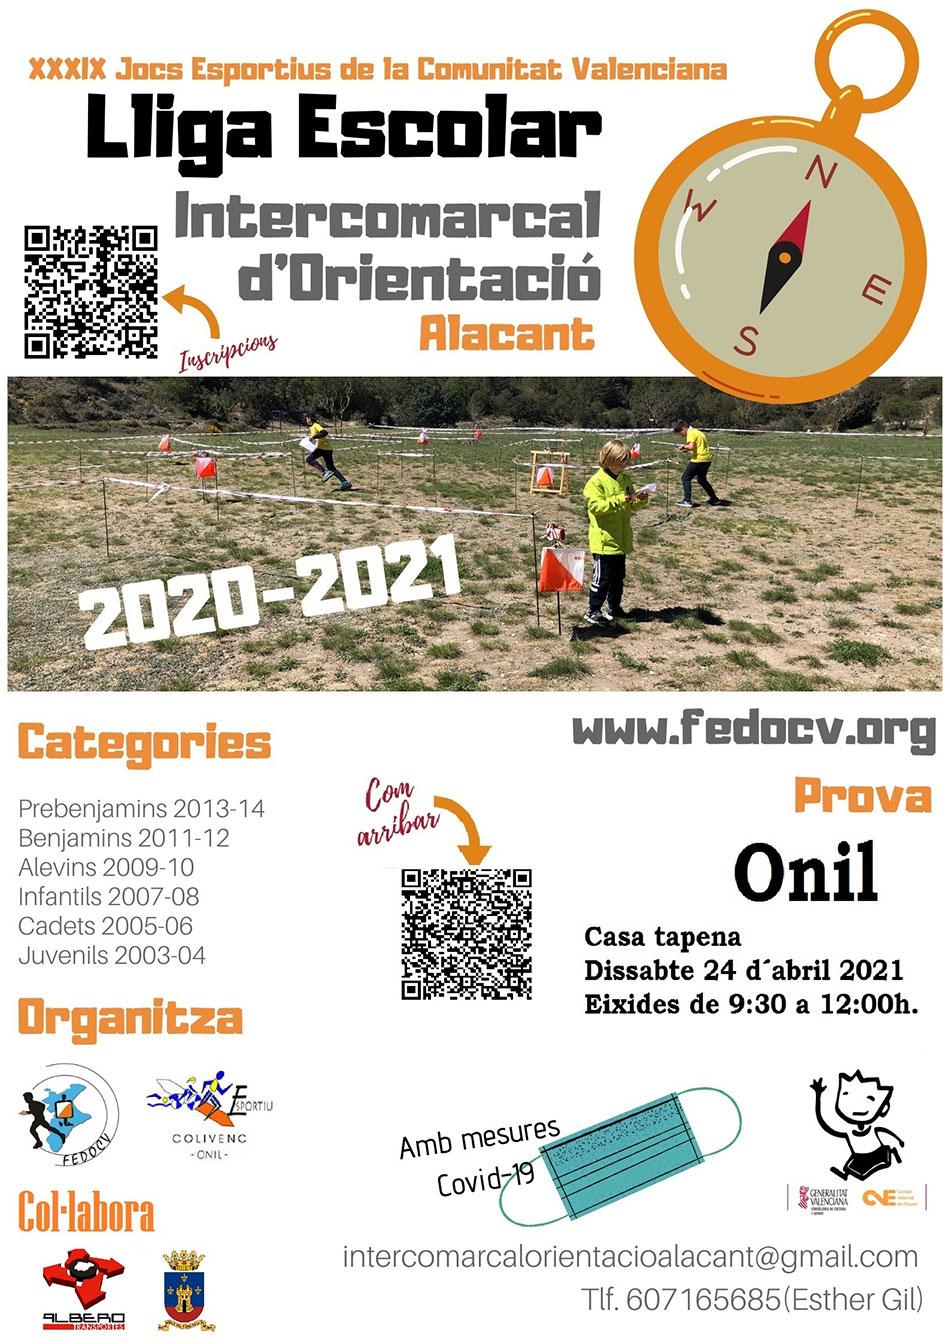 3ª prueba Liga Escolar Intercomarcal de Orientación de Alicante 2020/2021: Onil